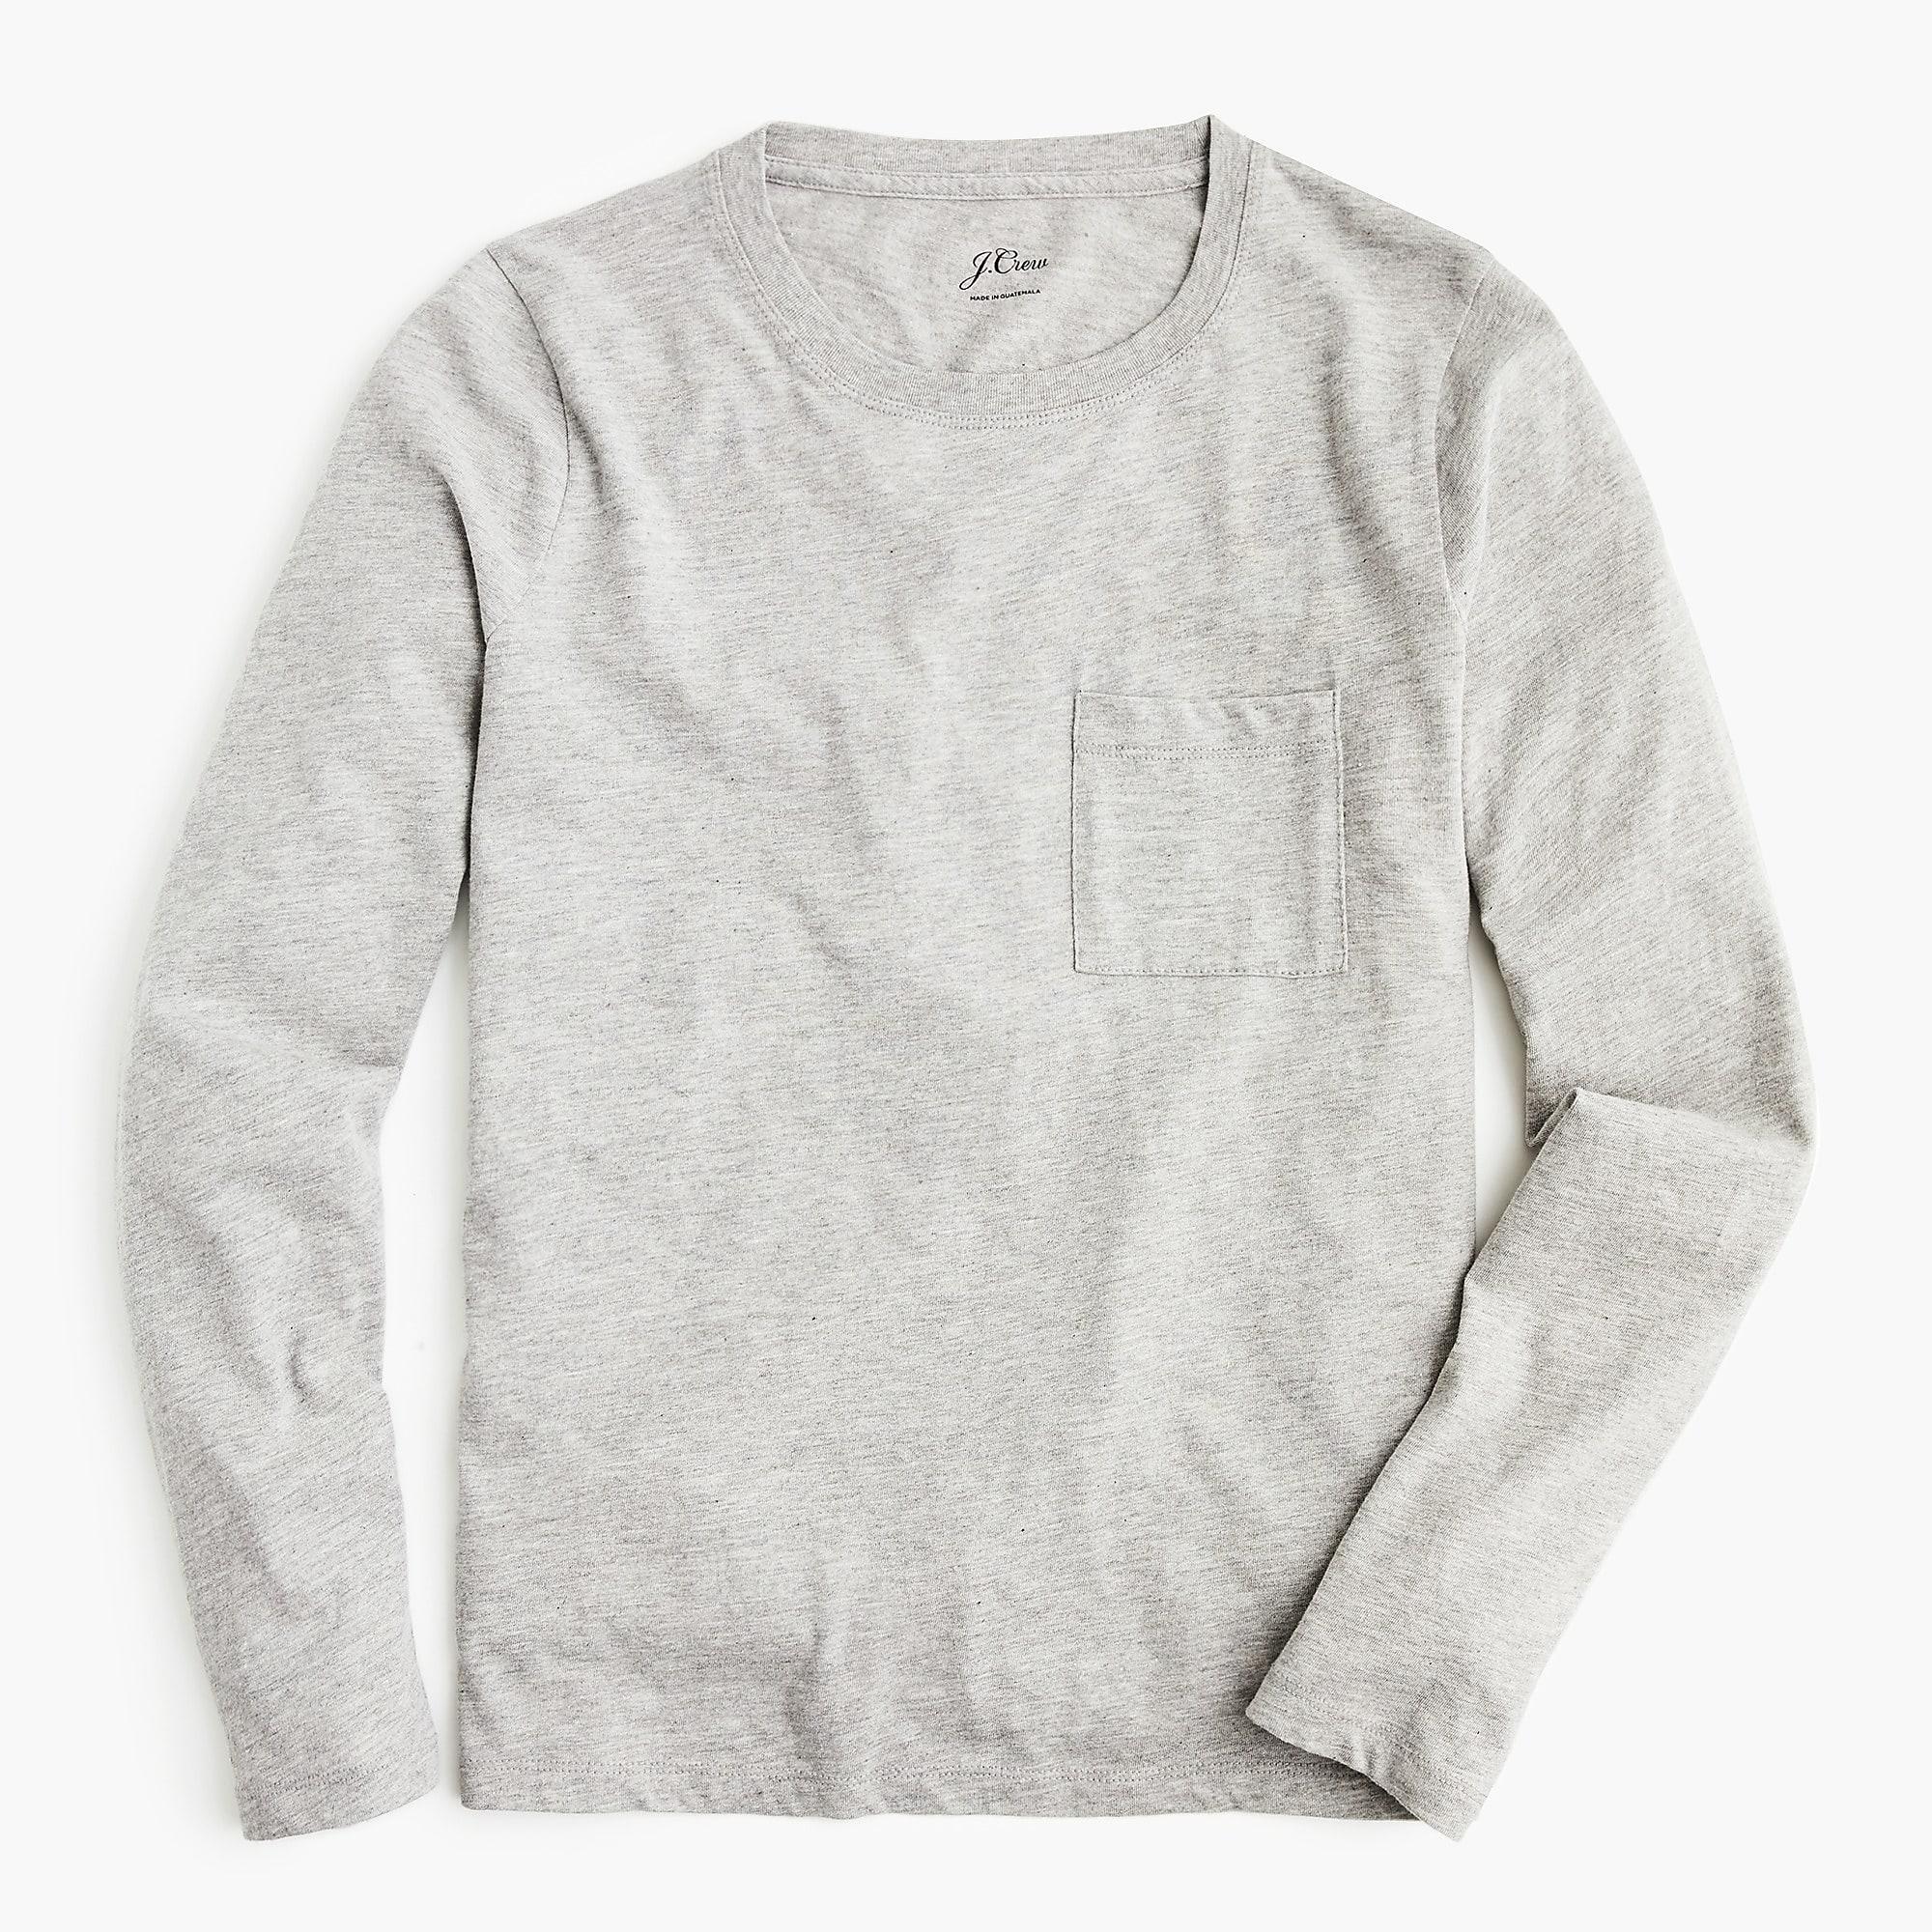 3bfcc909e644 Lyst - J.Crew Broken-in Long-sleeve Pocket T-shirt in Gray